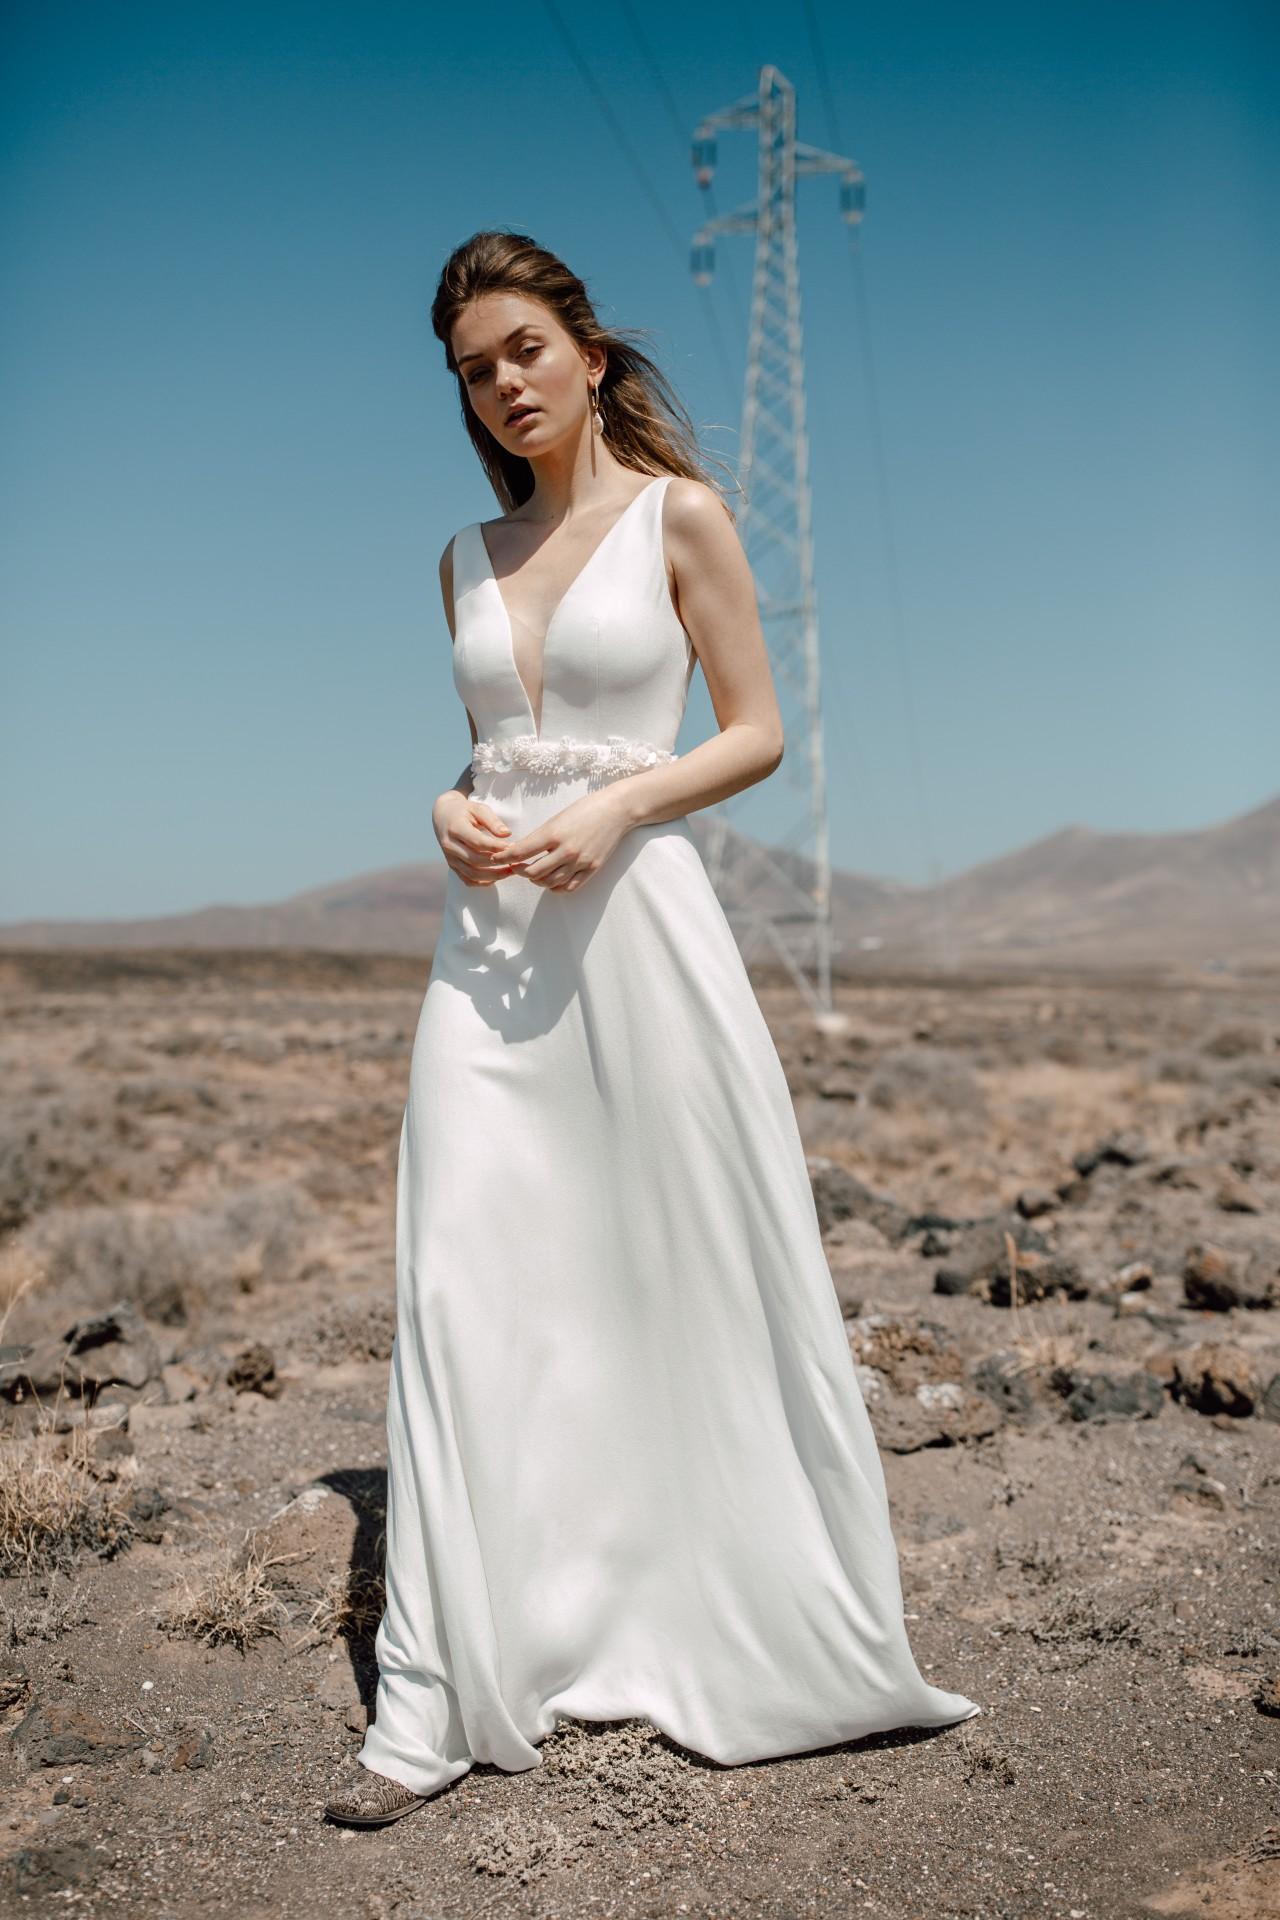 FAYA DRESS - Langes A-Linien Kleid mit V-Ausschnitt. Transparenter Tülleinsatz am Ausschnitt. Reißverschluss in der hinteren Mitte.Material: 100% CV1.750 €ohne Gürtel